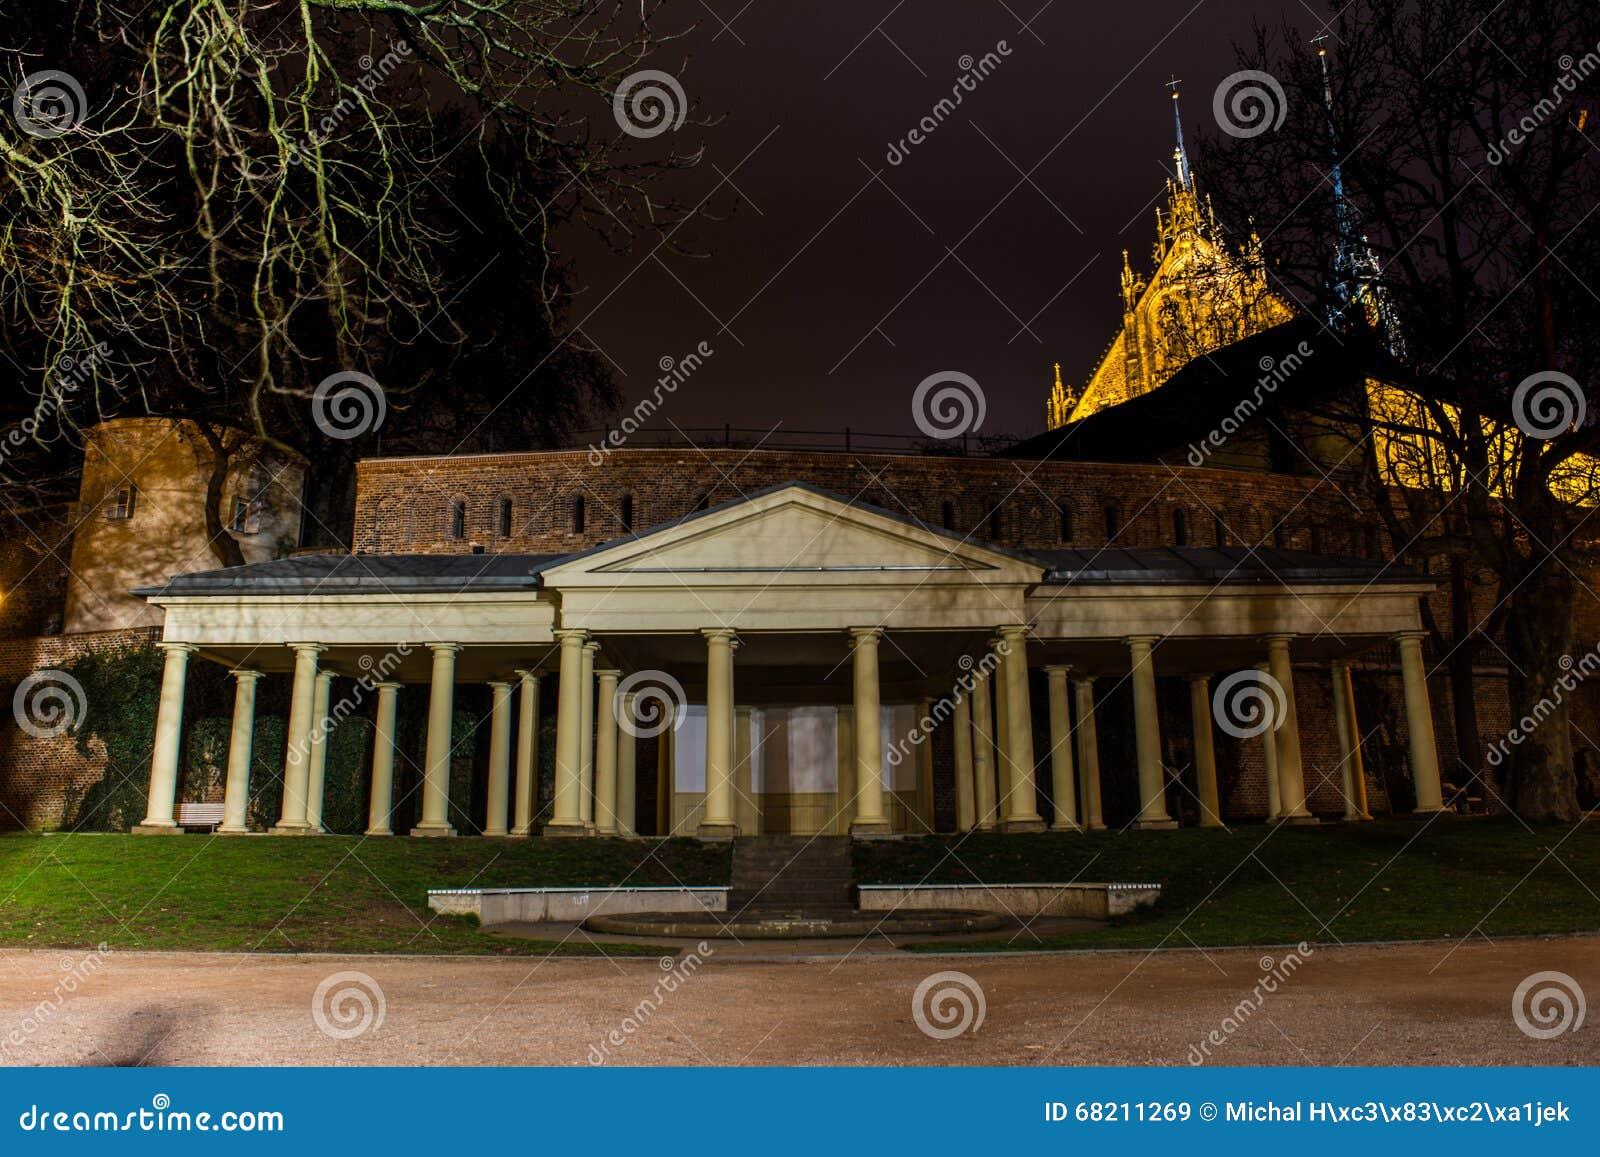 Denis Gardens stock image. Image of historical, moravia - 68211269